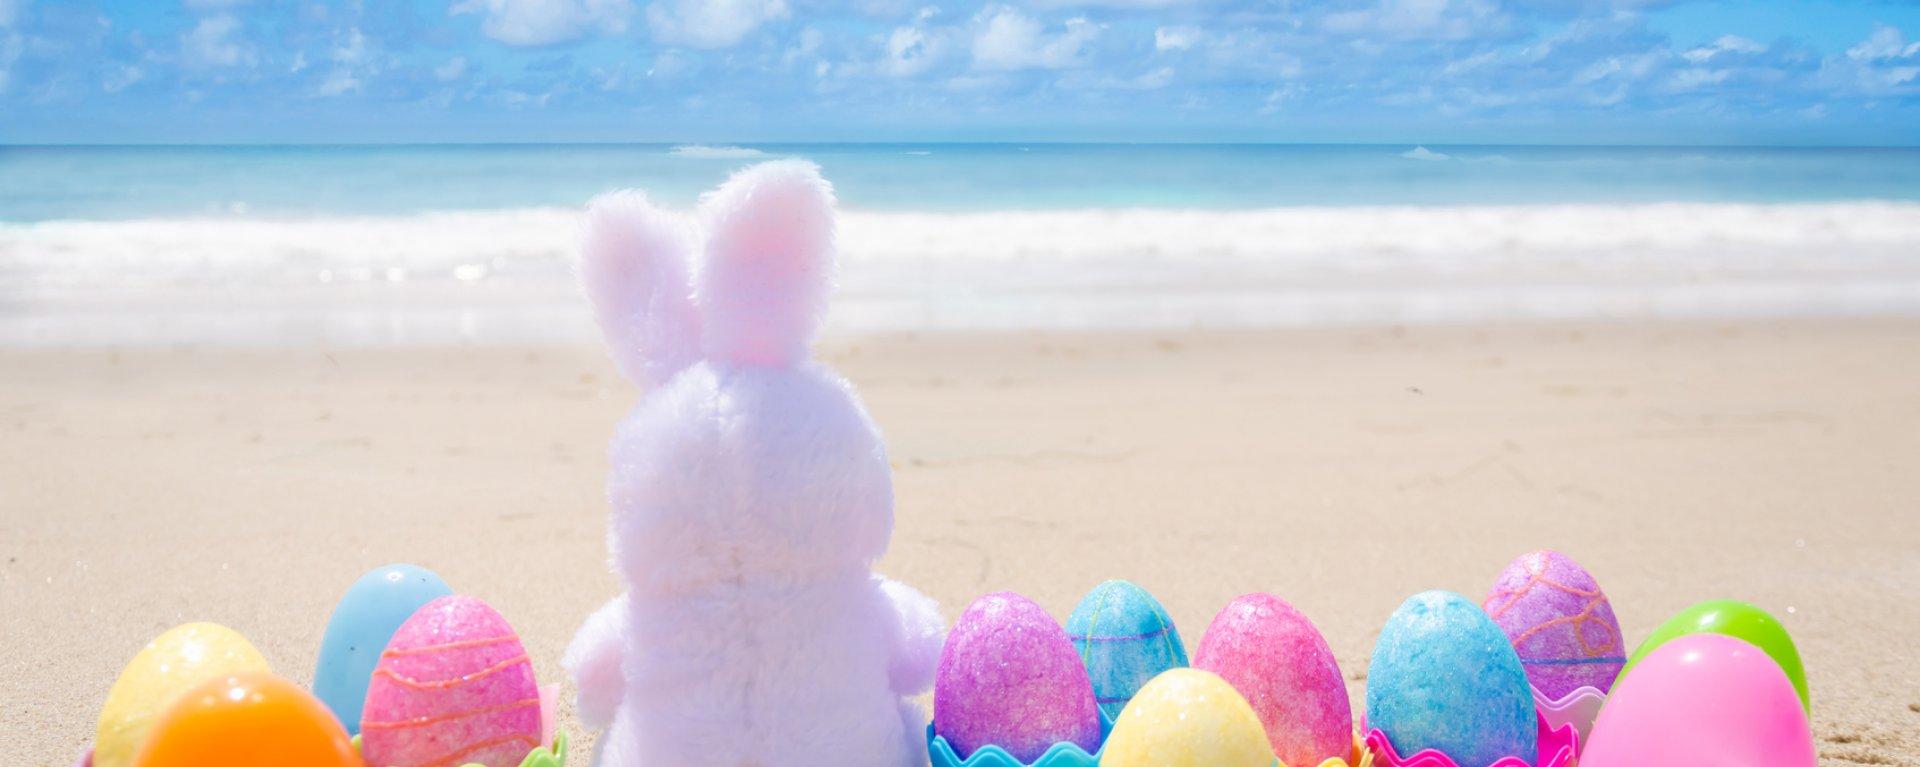 Wielkanoc nad Bałtykiem